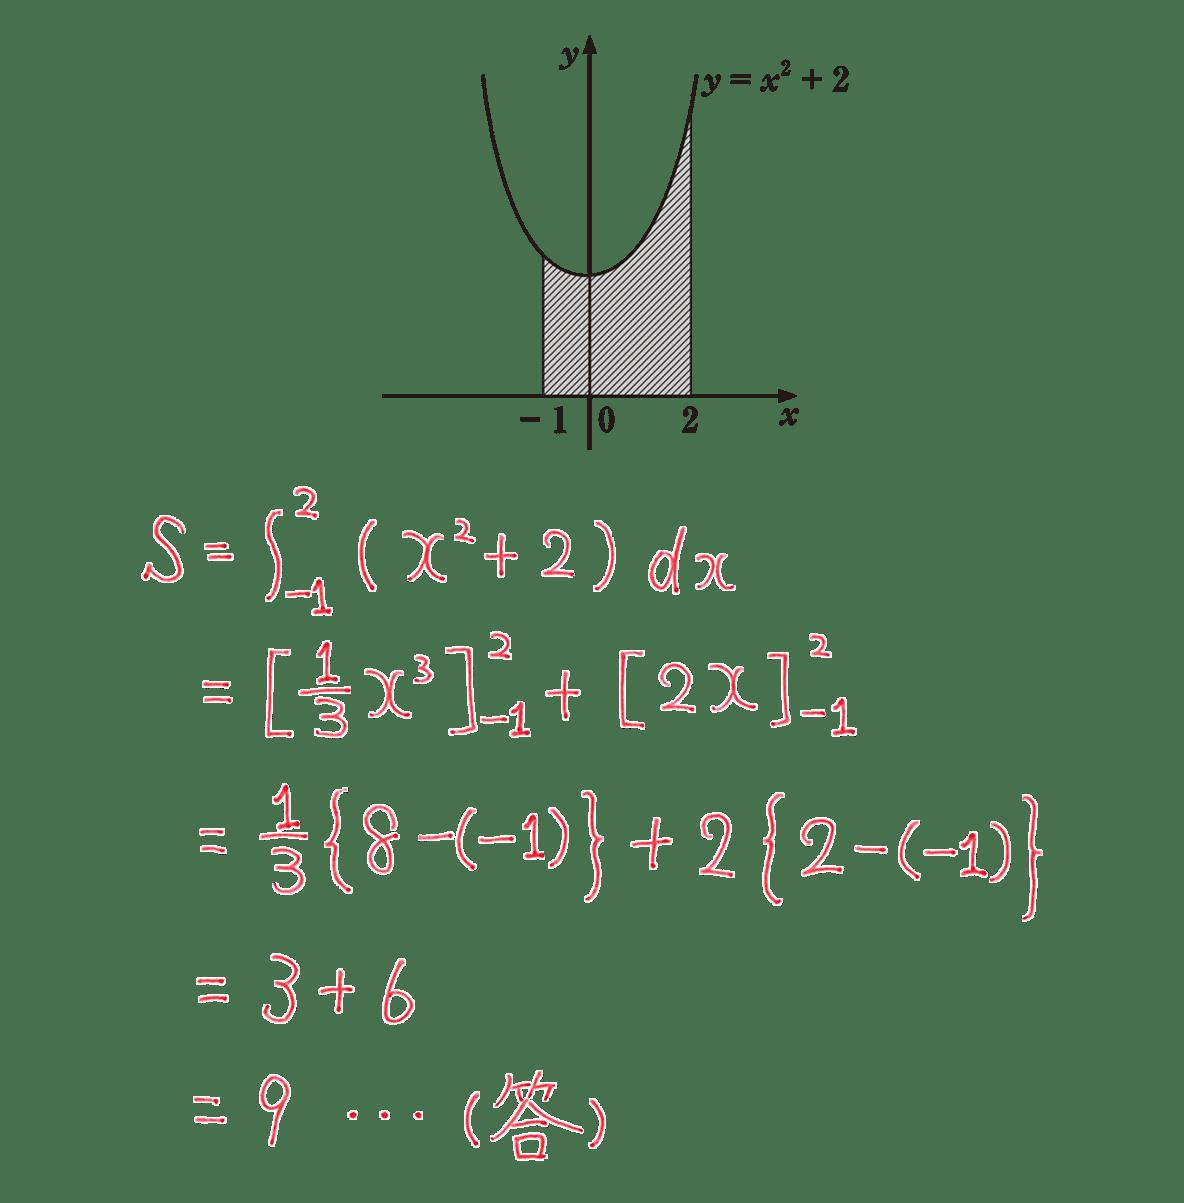 高校数学Ⅱ 微分法と積分法23 練習 答え